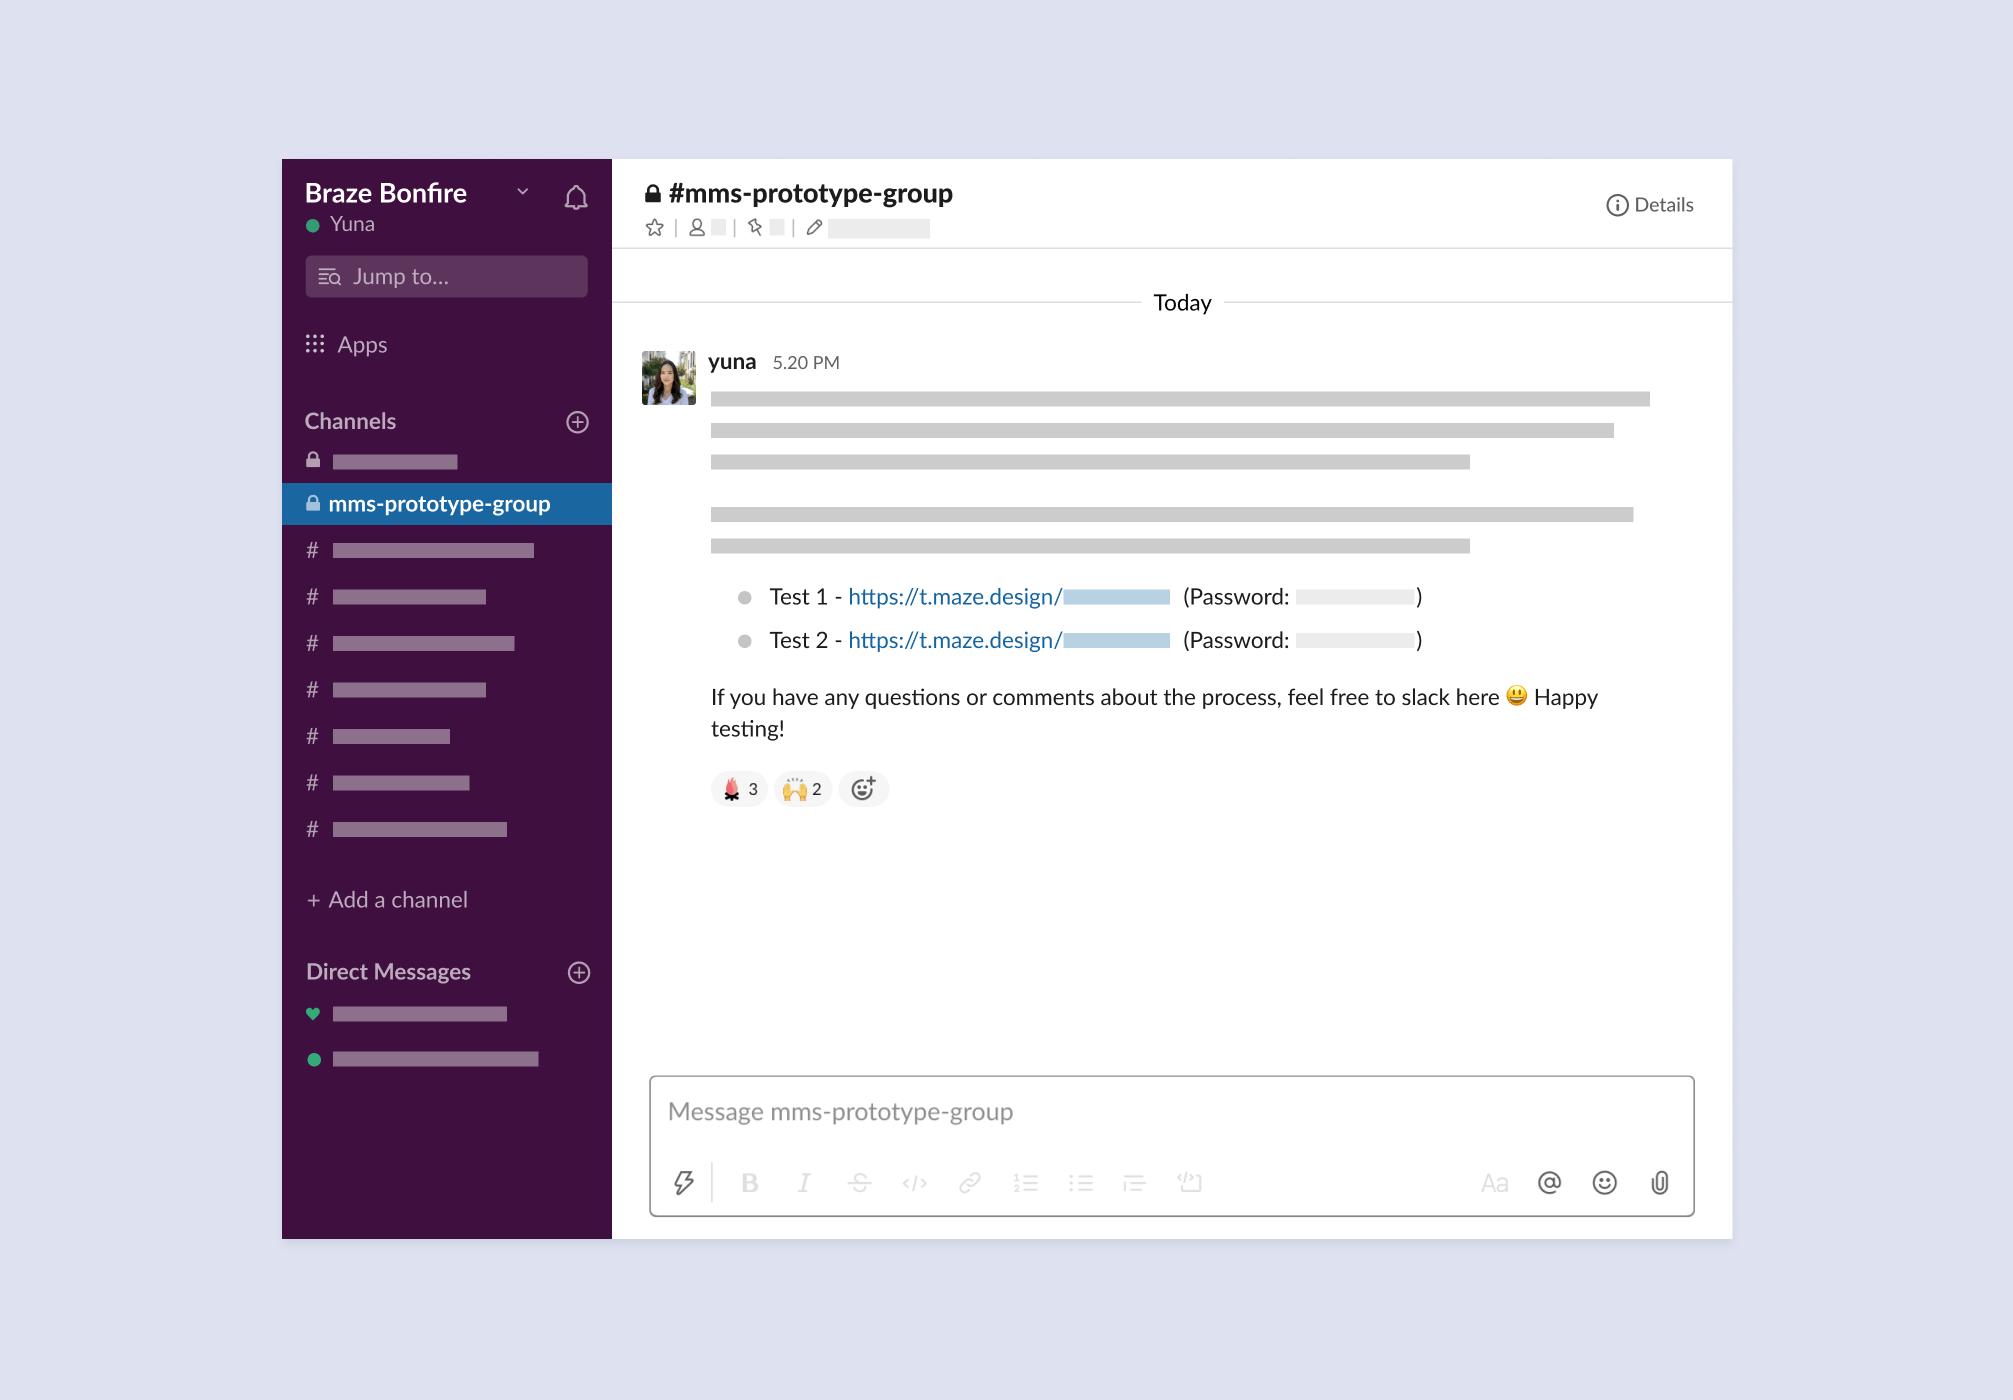 Braze uses a private Slack channel to invite testers